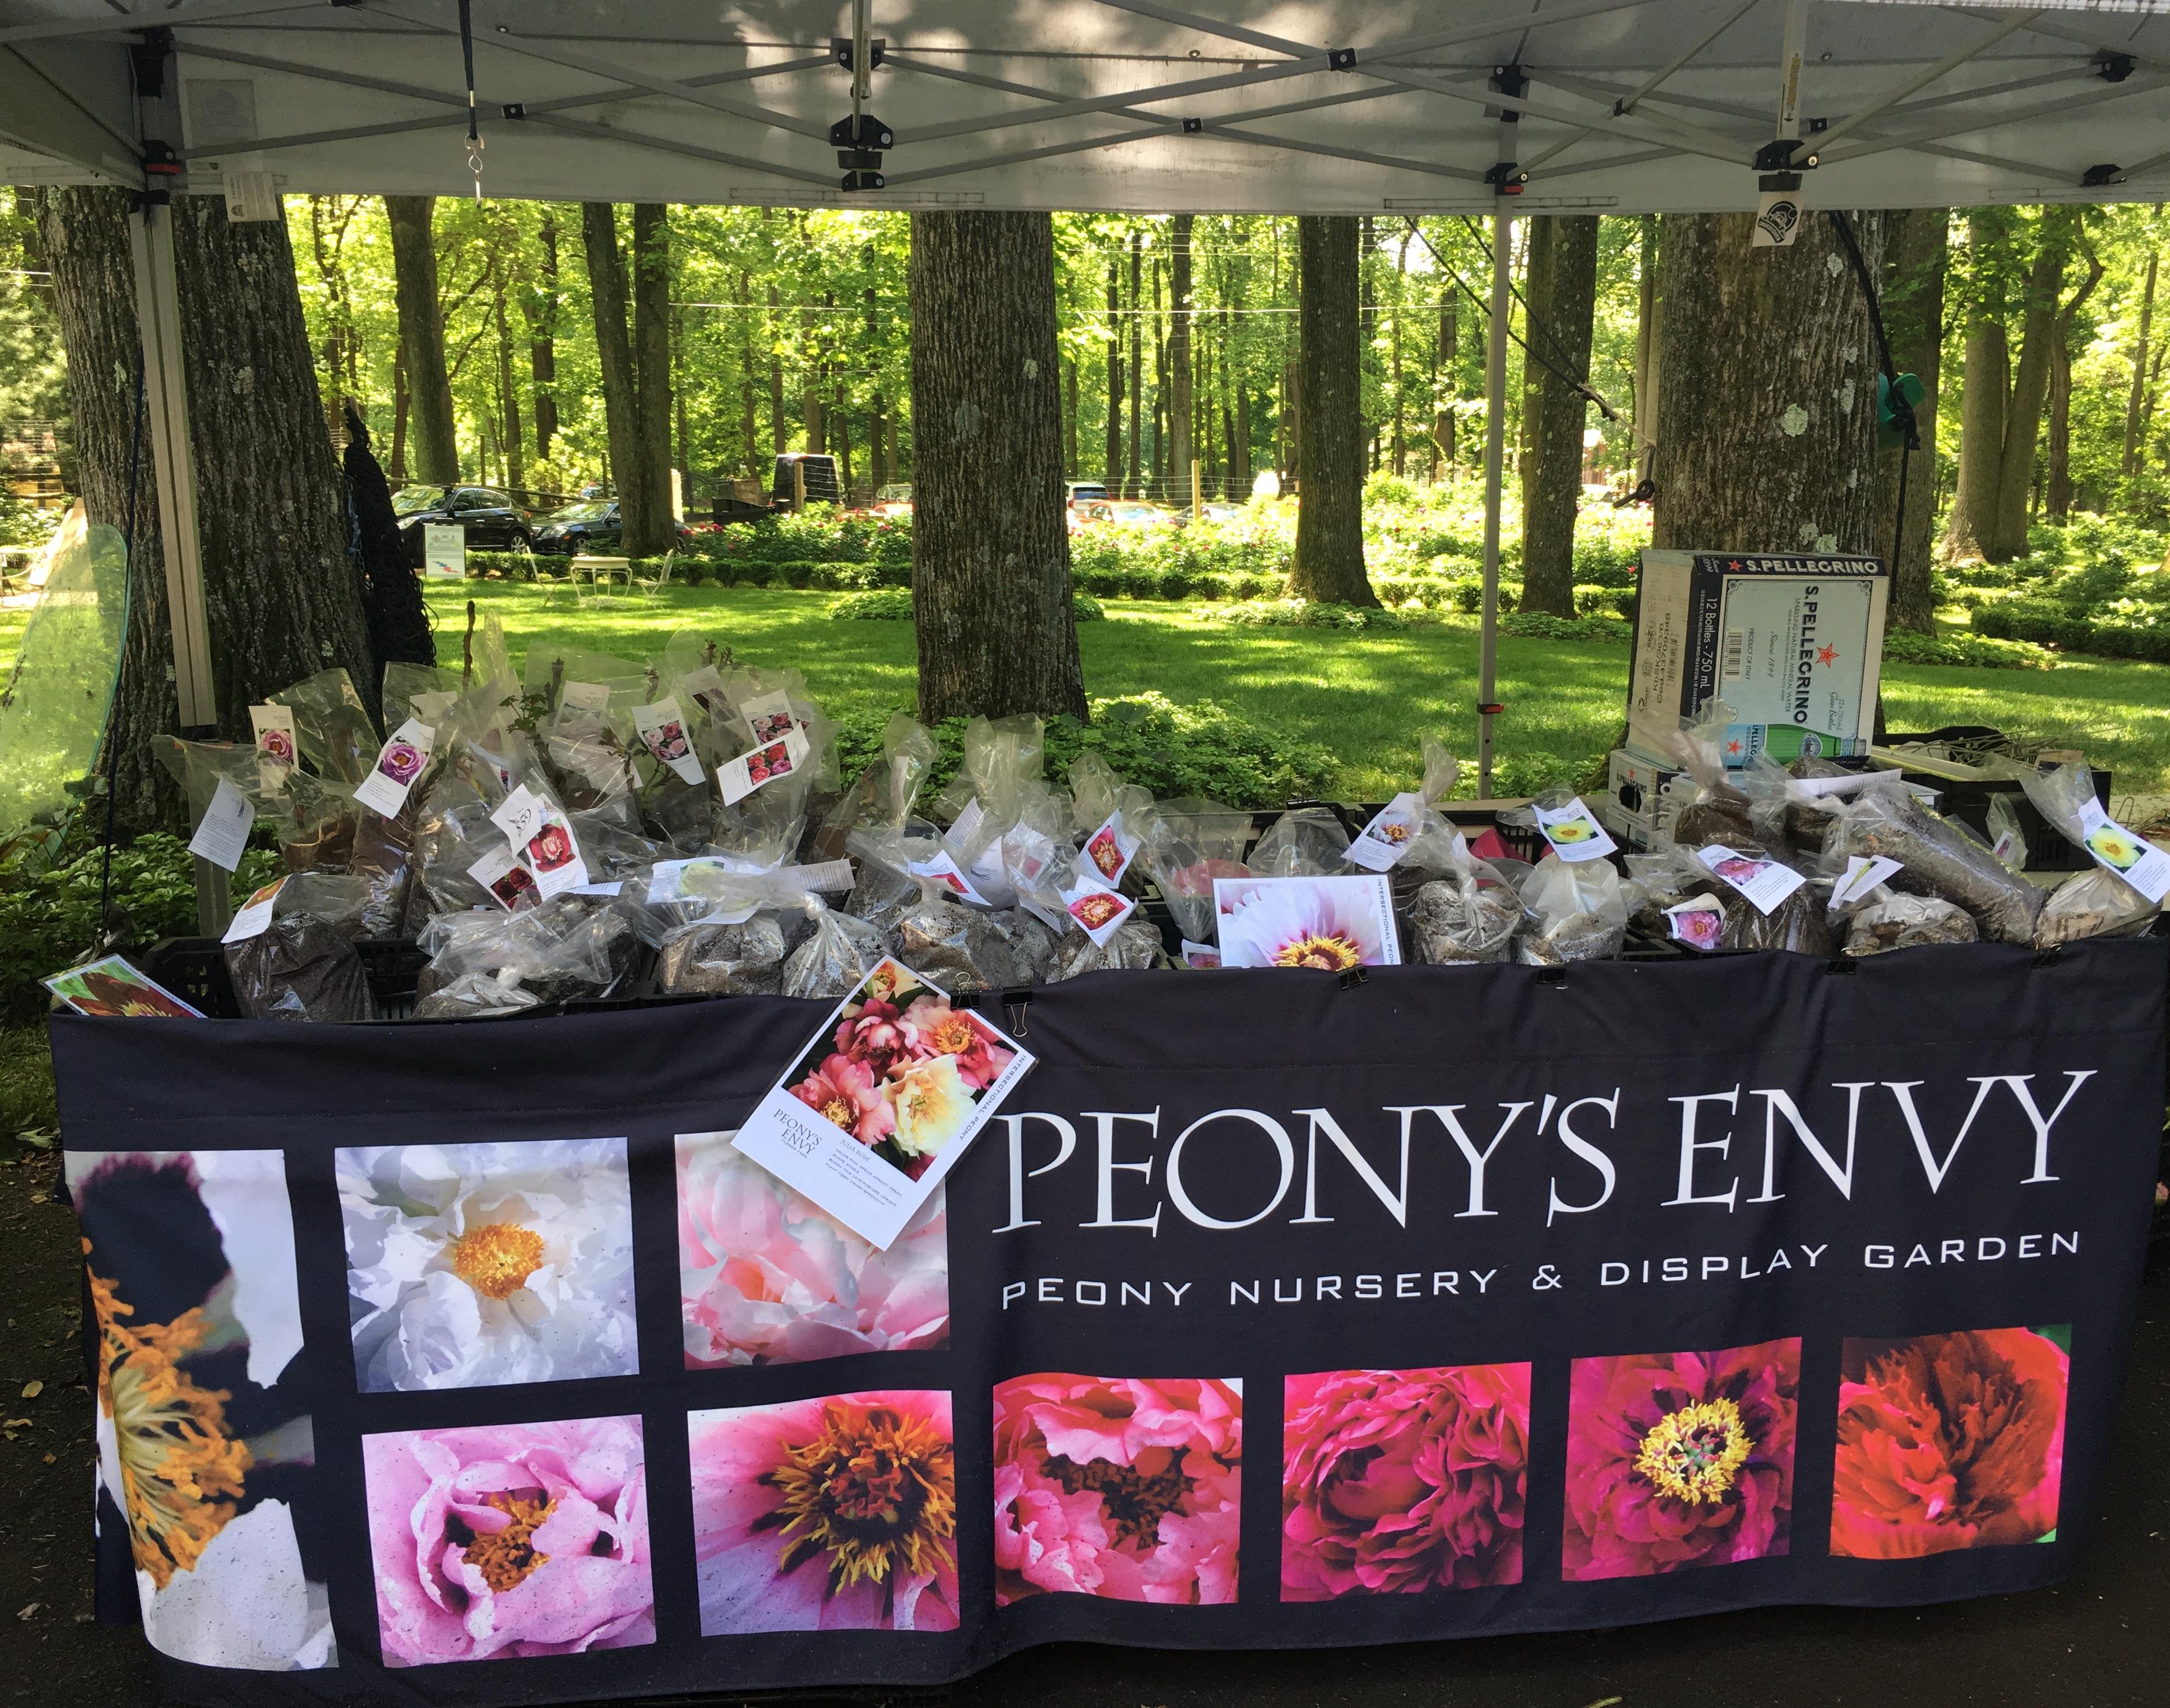 Peony's Envy Bernardsville NJ Lauren Simoes